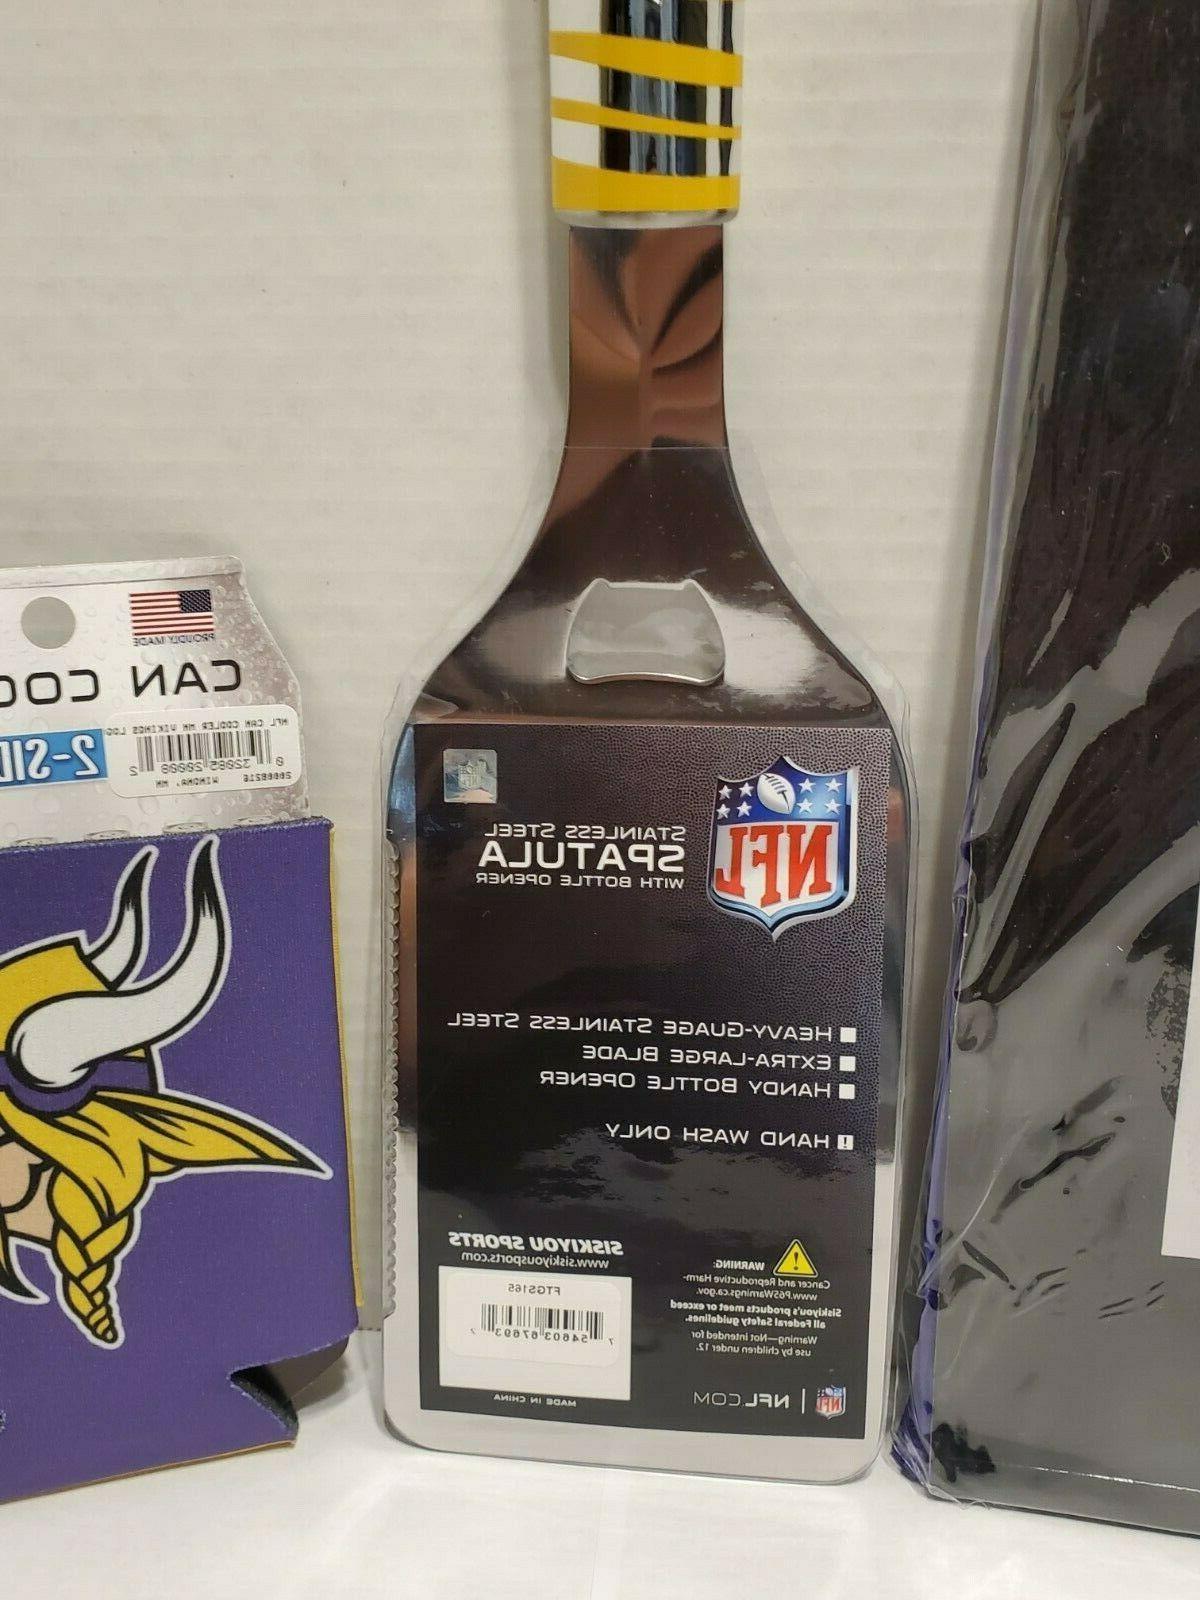 Minnesota Vikings spatula, can cozy